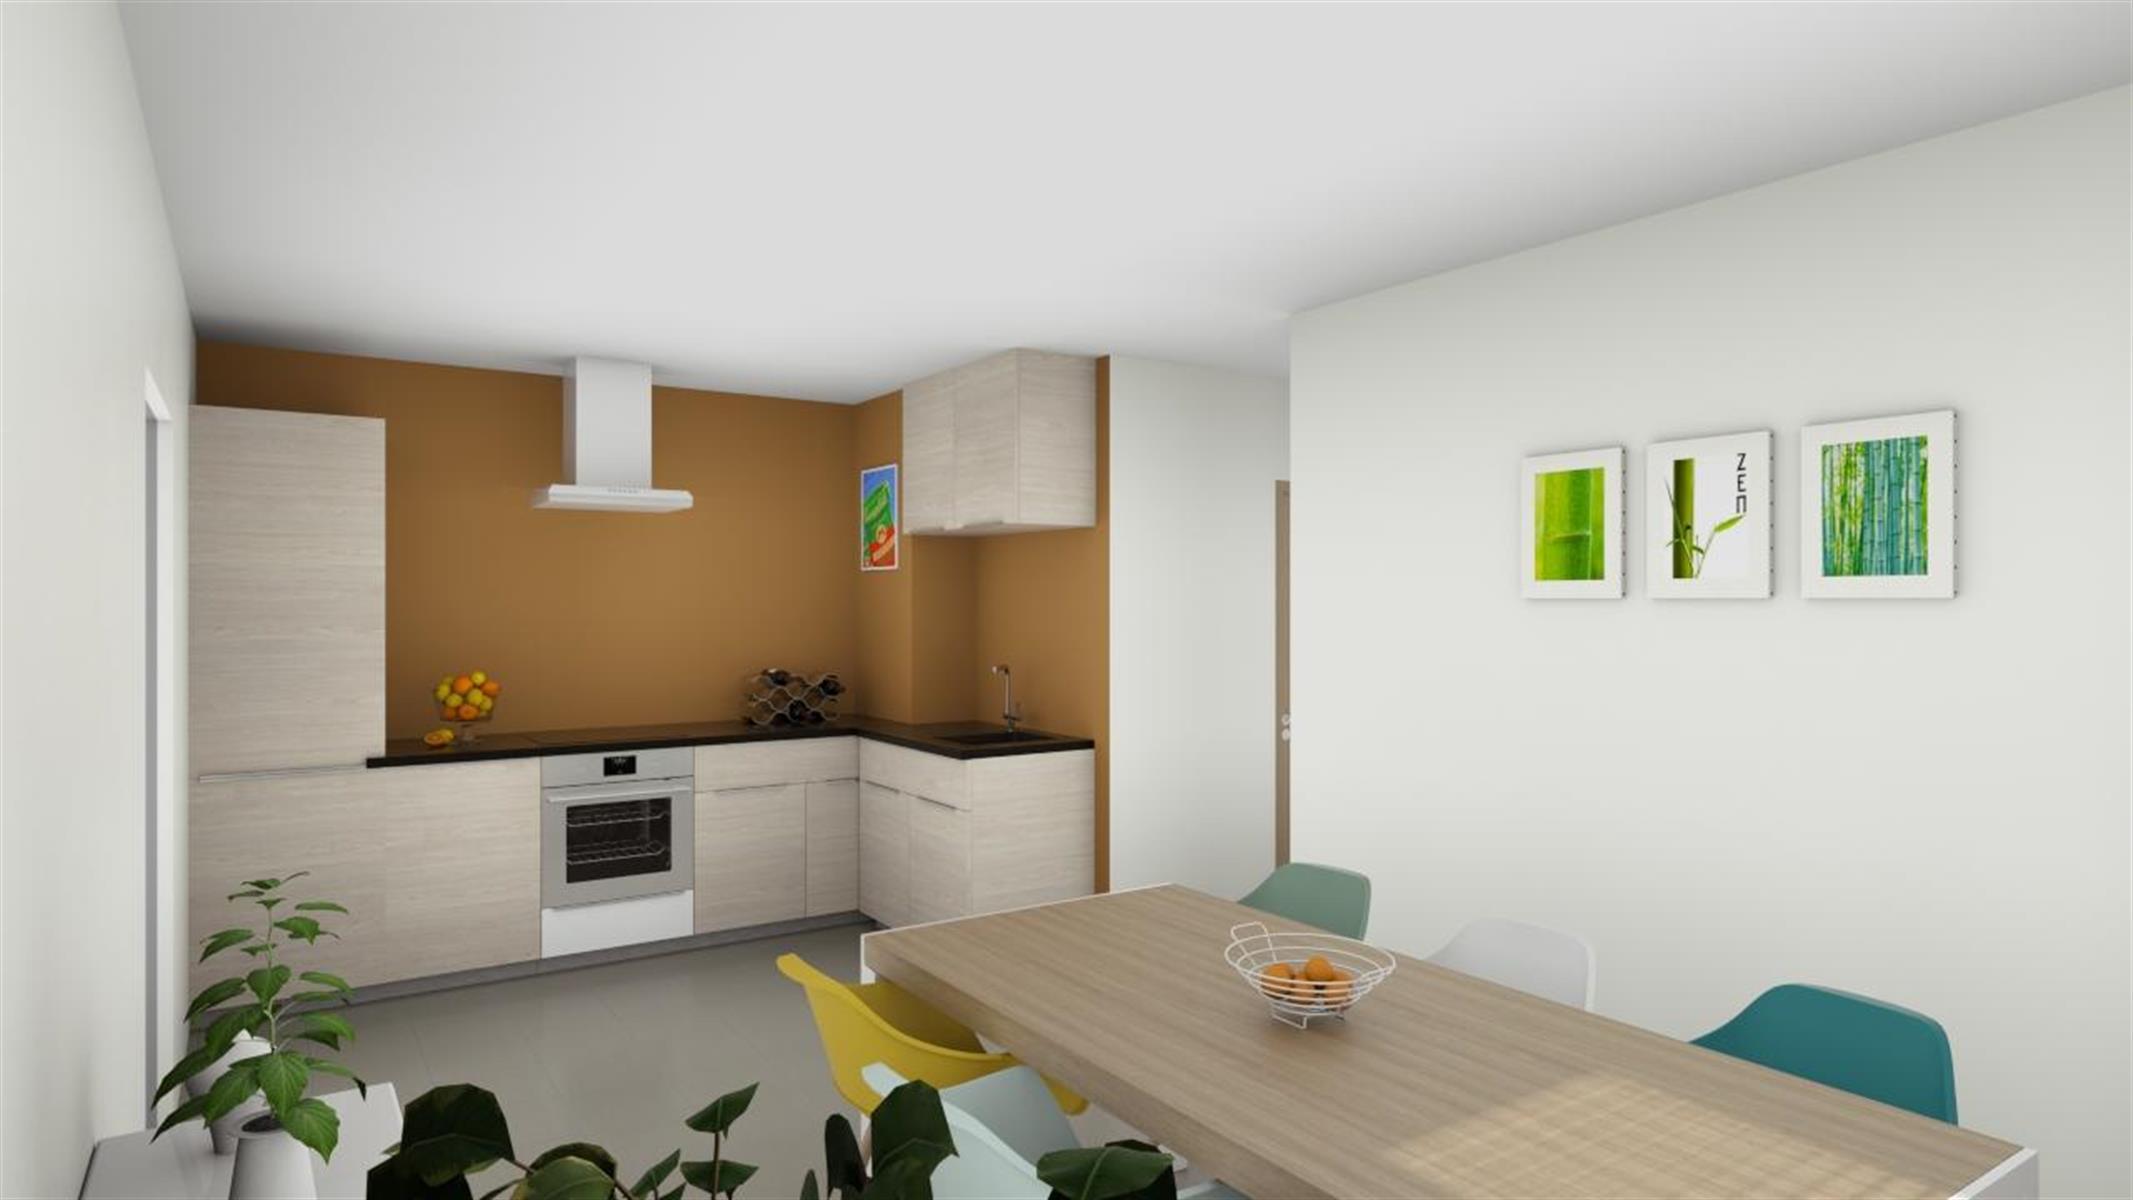 Appartement de standing 1 chambre